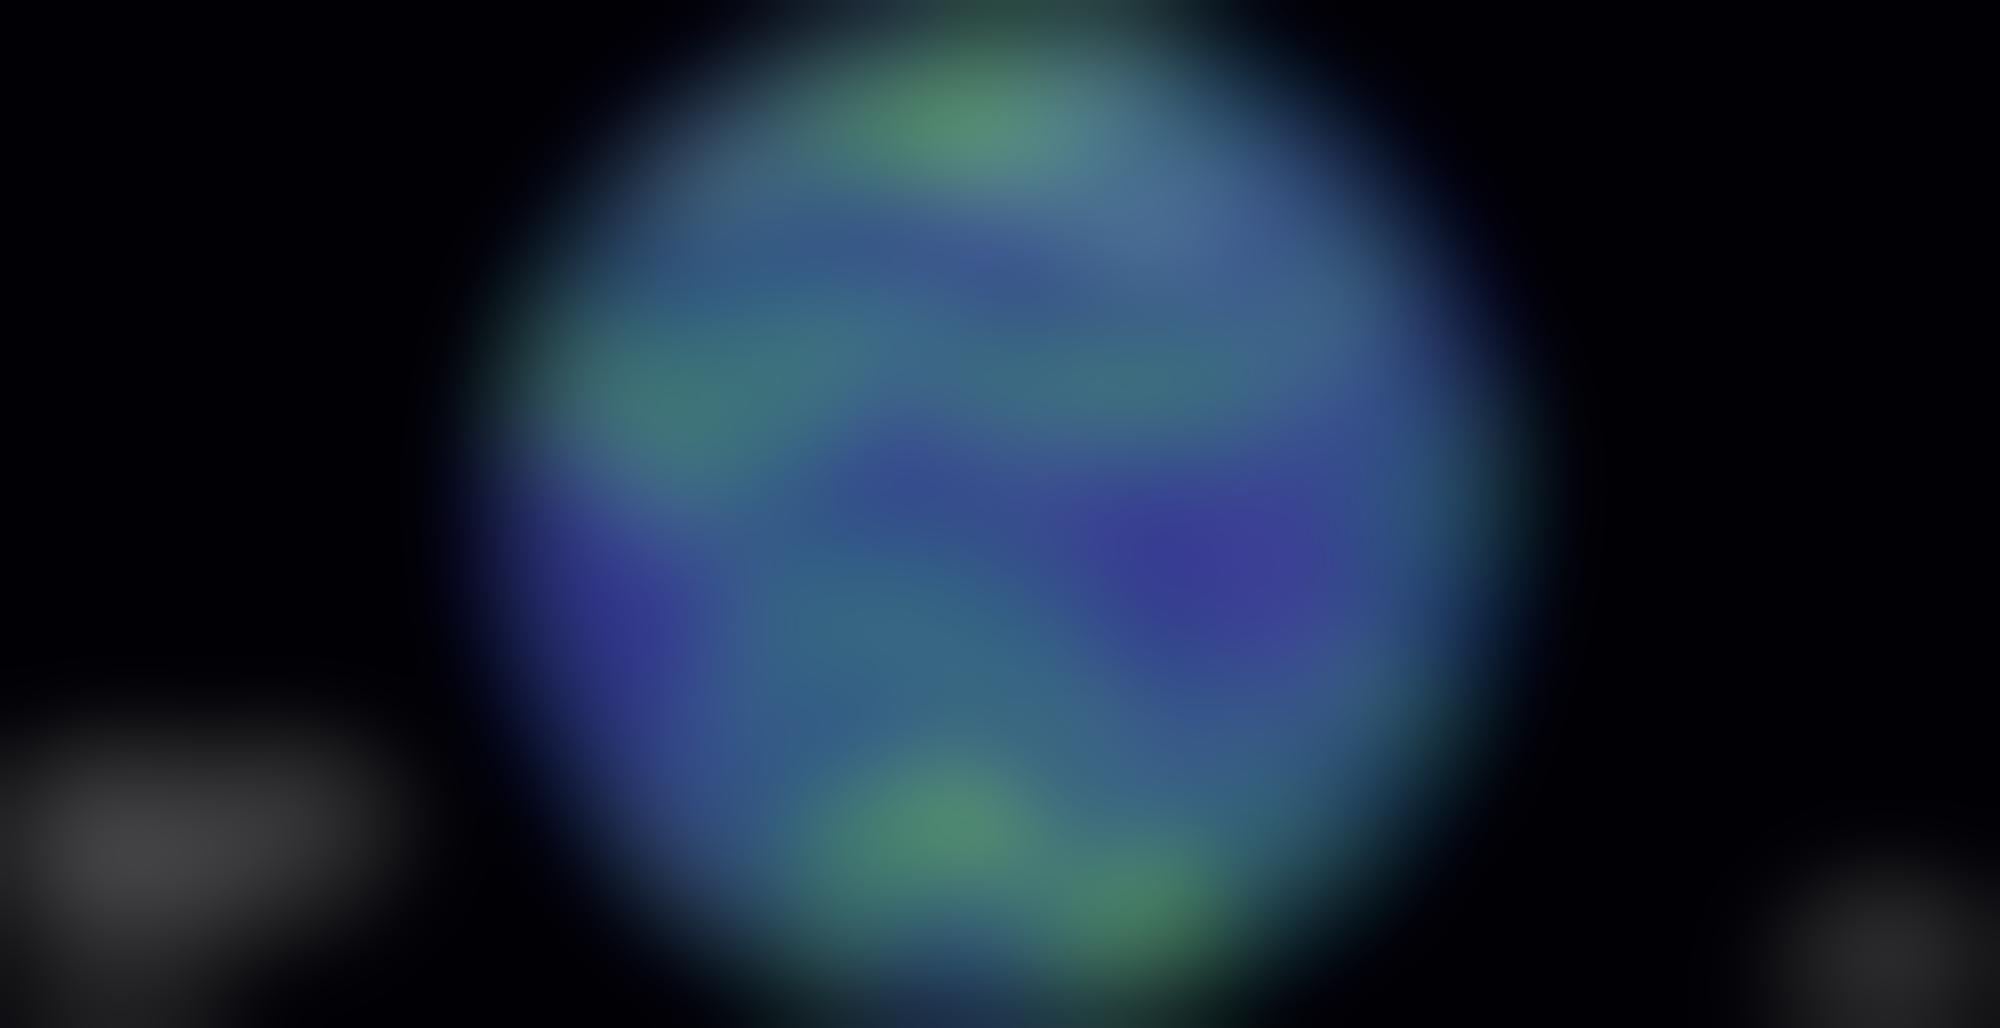 Screenshot 2020 02 11 at 10 52 46 autocompressfitresizeixlibphp 1 1 0max h2000max w3 D2000q80s6f38afeb2726053a3839437232c1c793